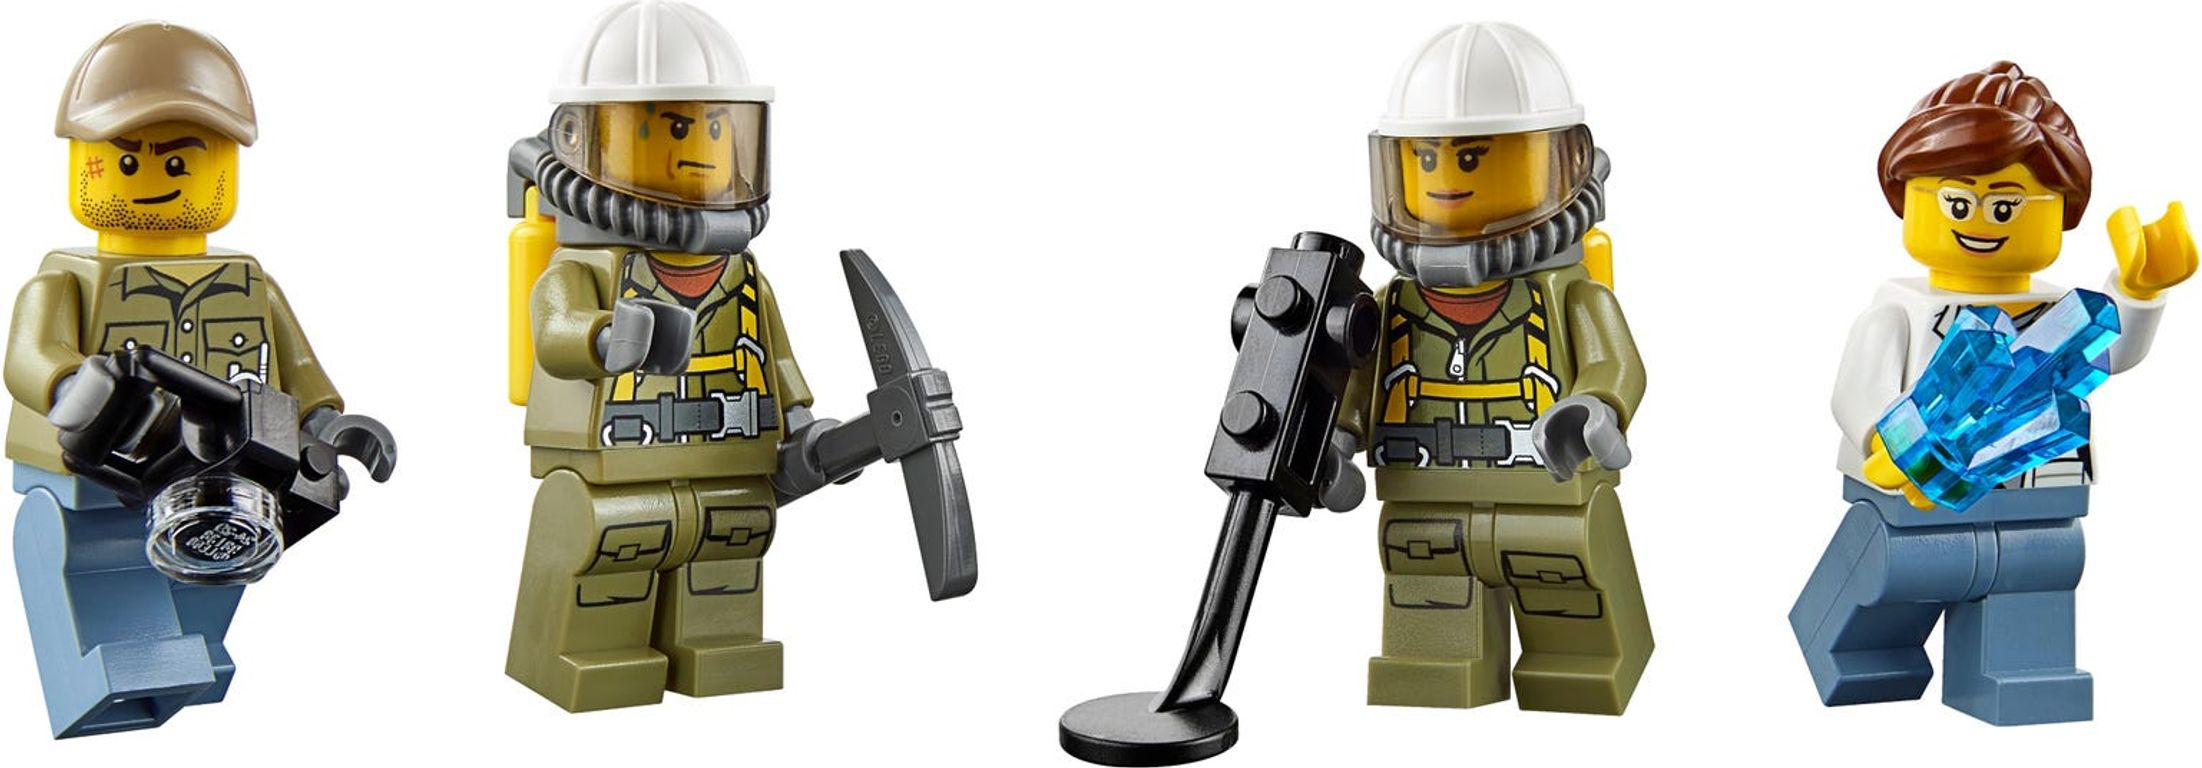 LEGO® City Volcano Starter Set minifigures